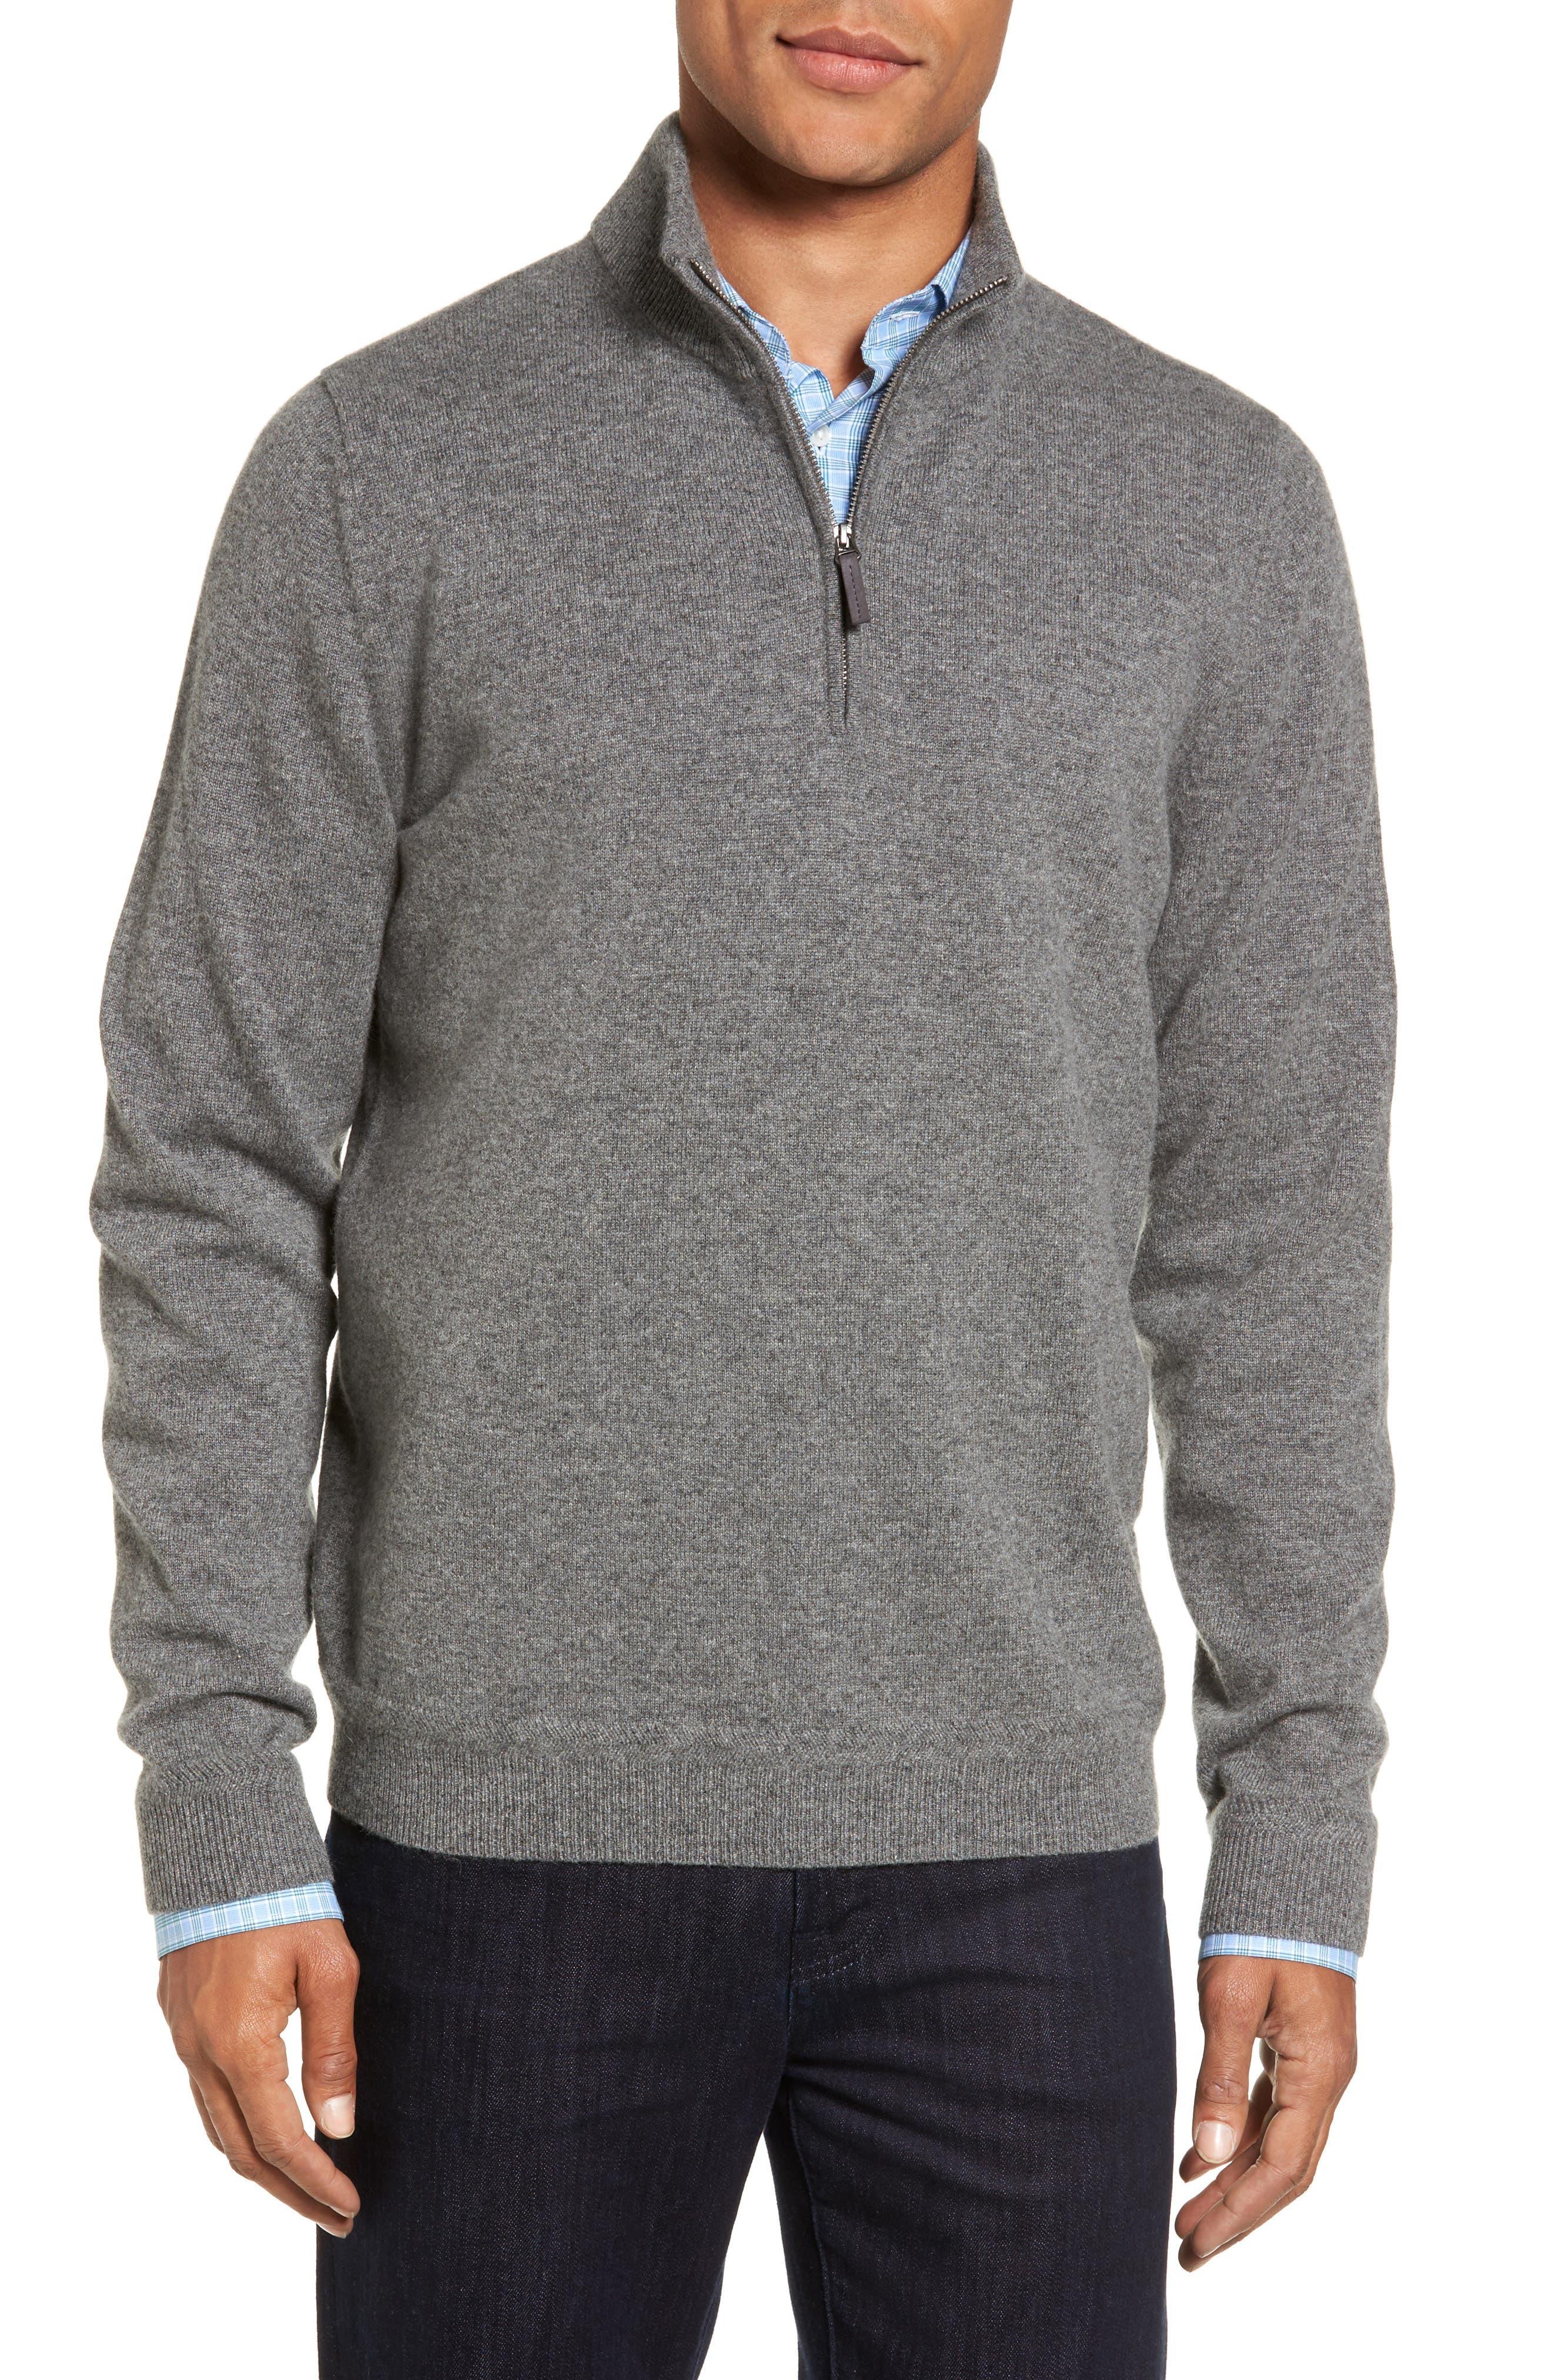 Main Image - John W. Nordstrom® Quarter Zip Cashmere Sweater (Regular & Tall)